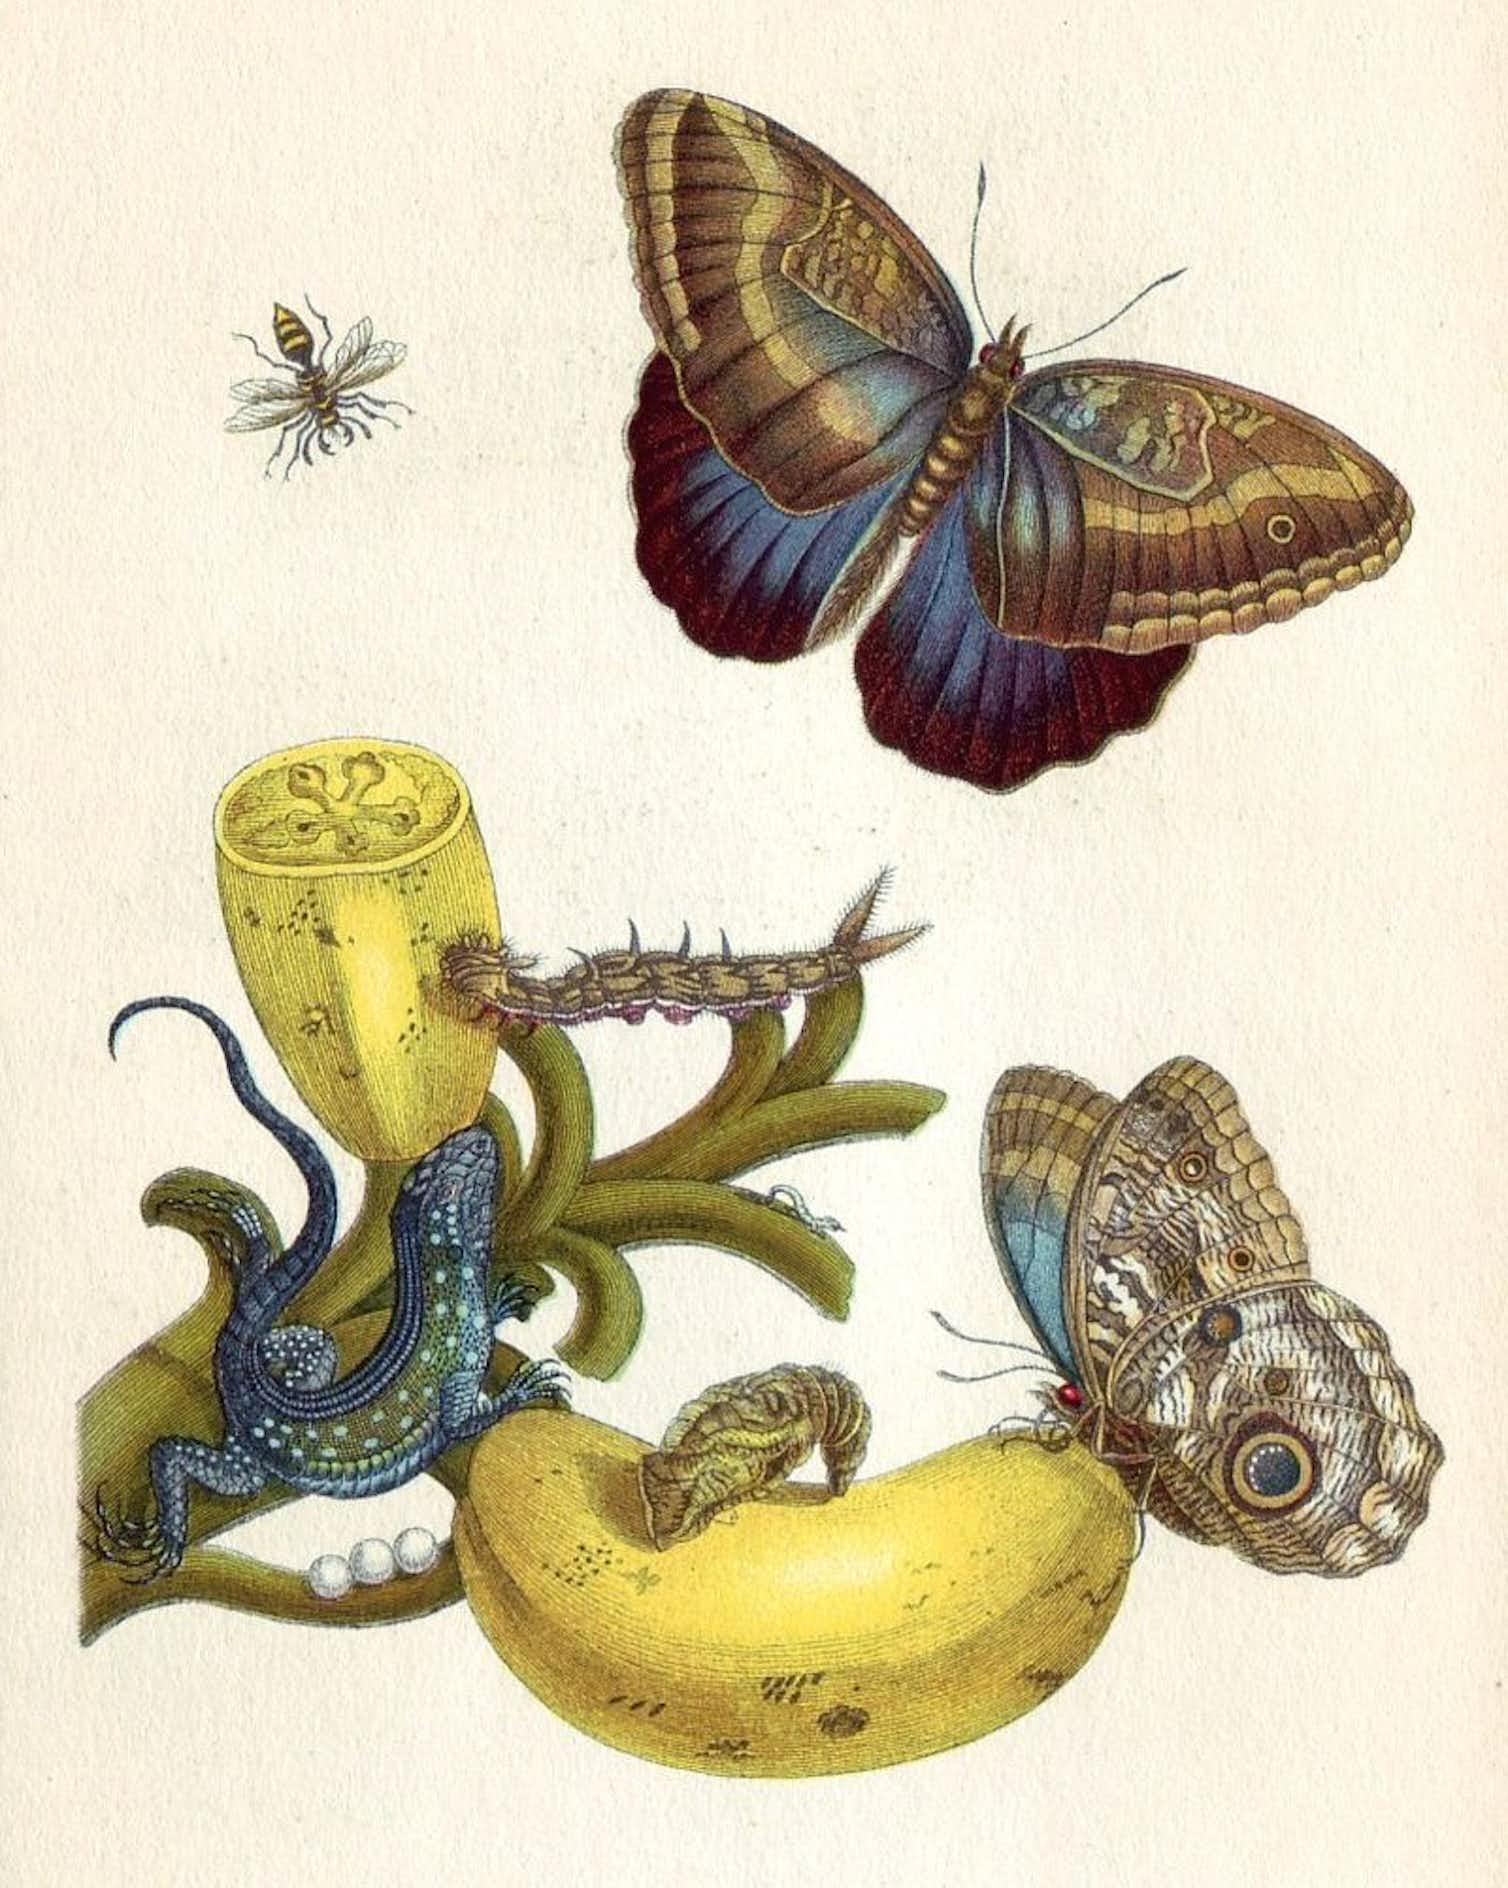 Maria Sibylla Merian, illuminated copper-engraving from Metamorphosis insectorum Surinamensium, Plate XXIII. Solanum mammosum 1705. Credit: Wikimedia Commons